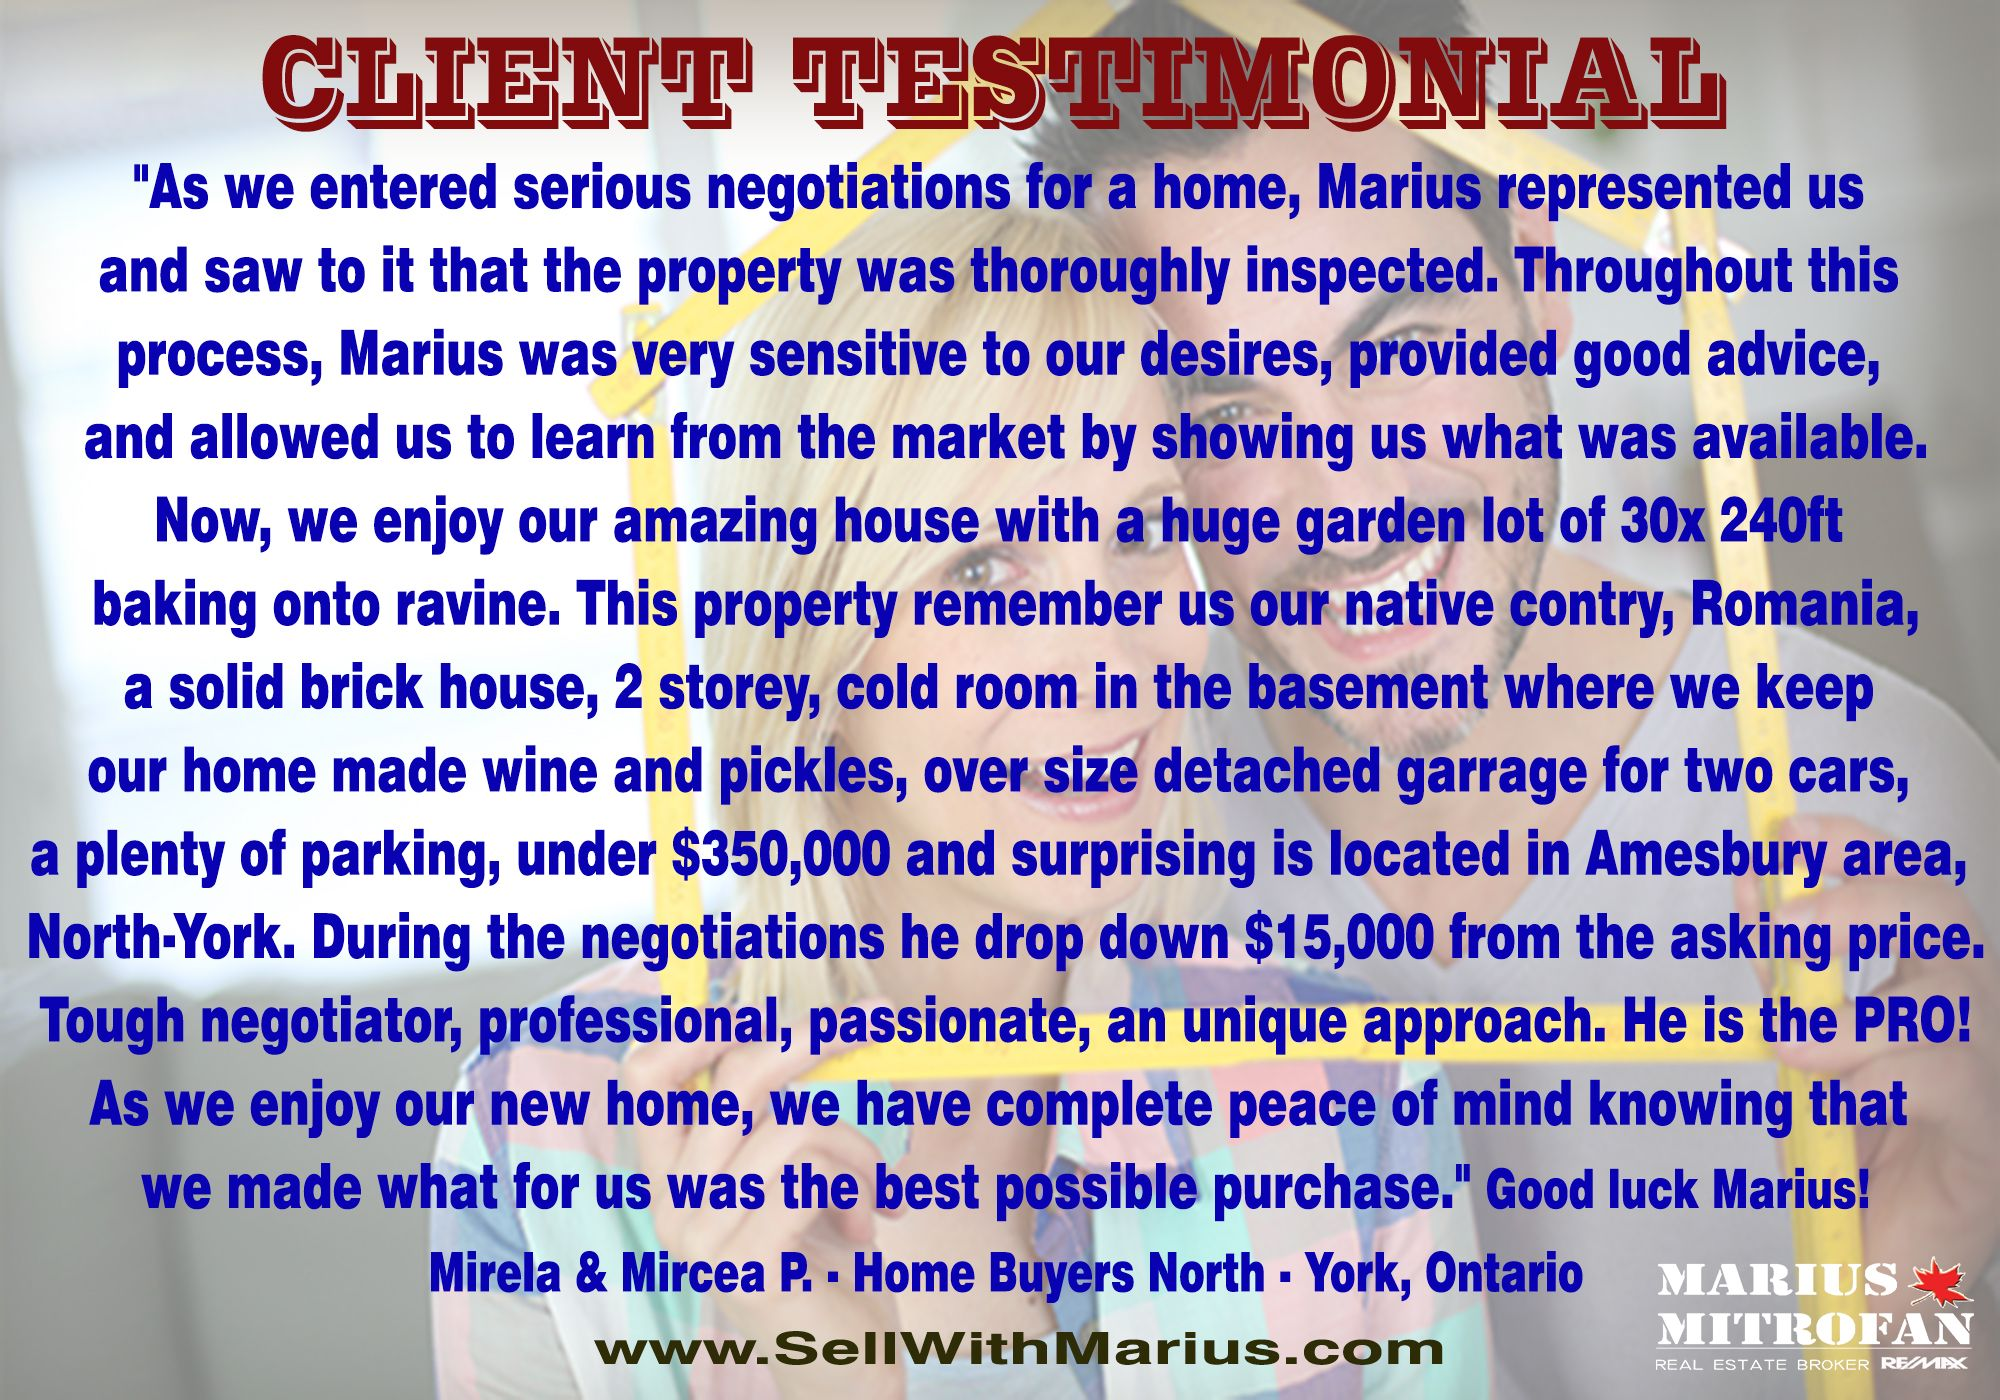 Happy client!  - Client Testimonials of @Marius Mitrofan Real Estate Broker